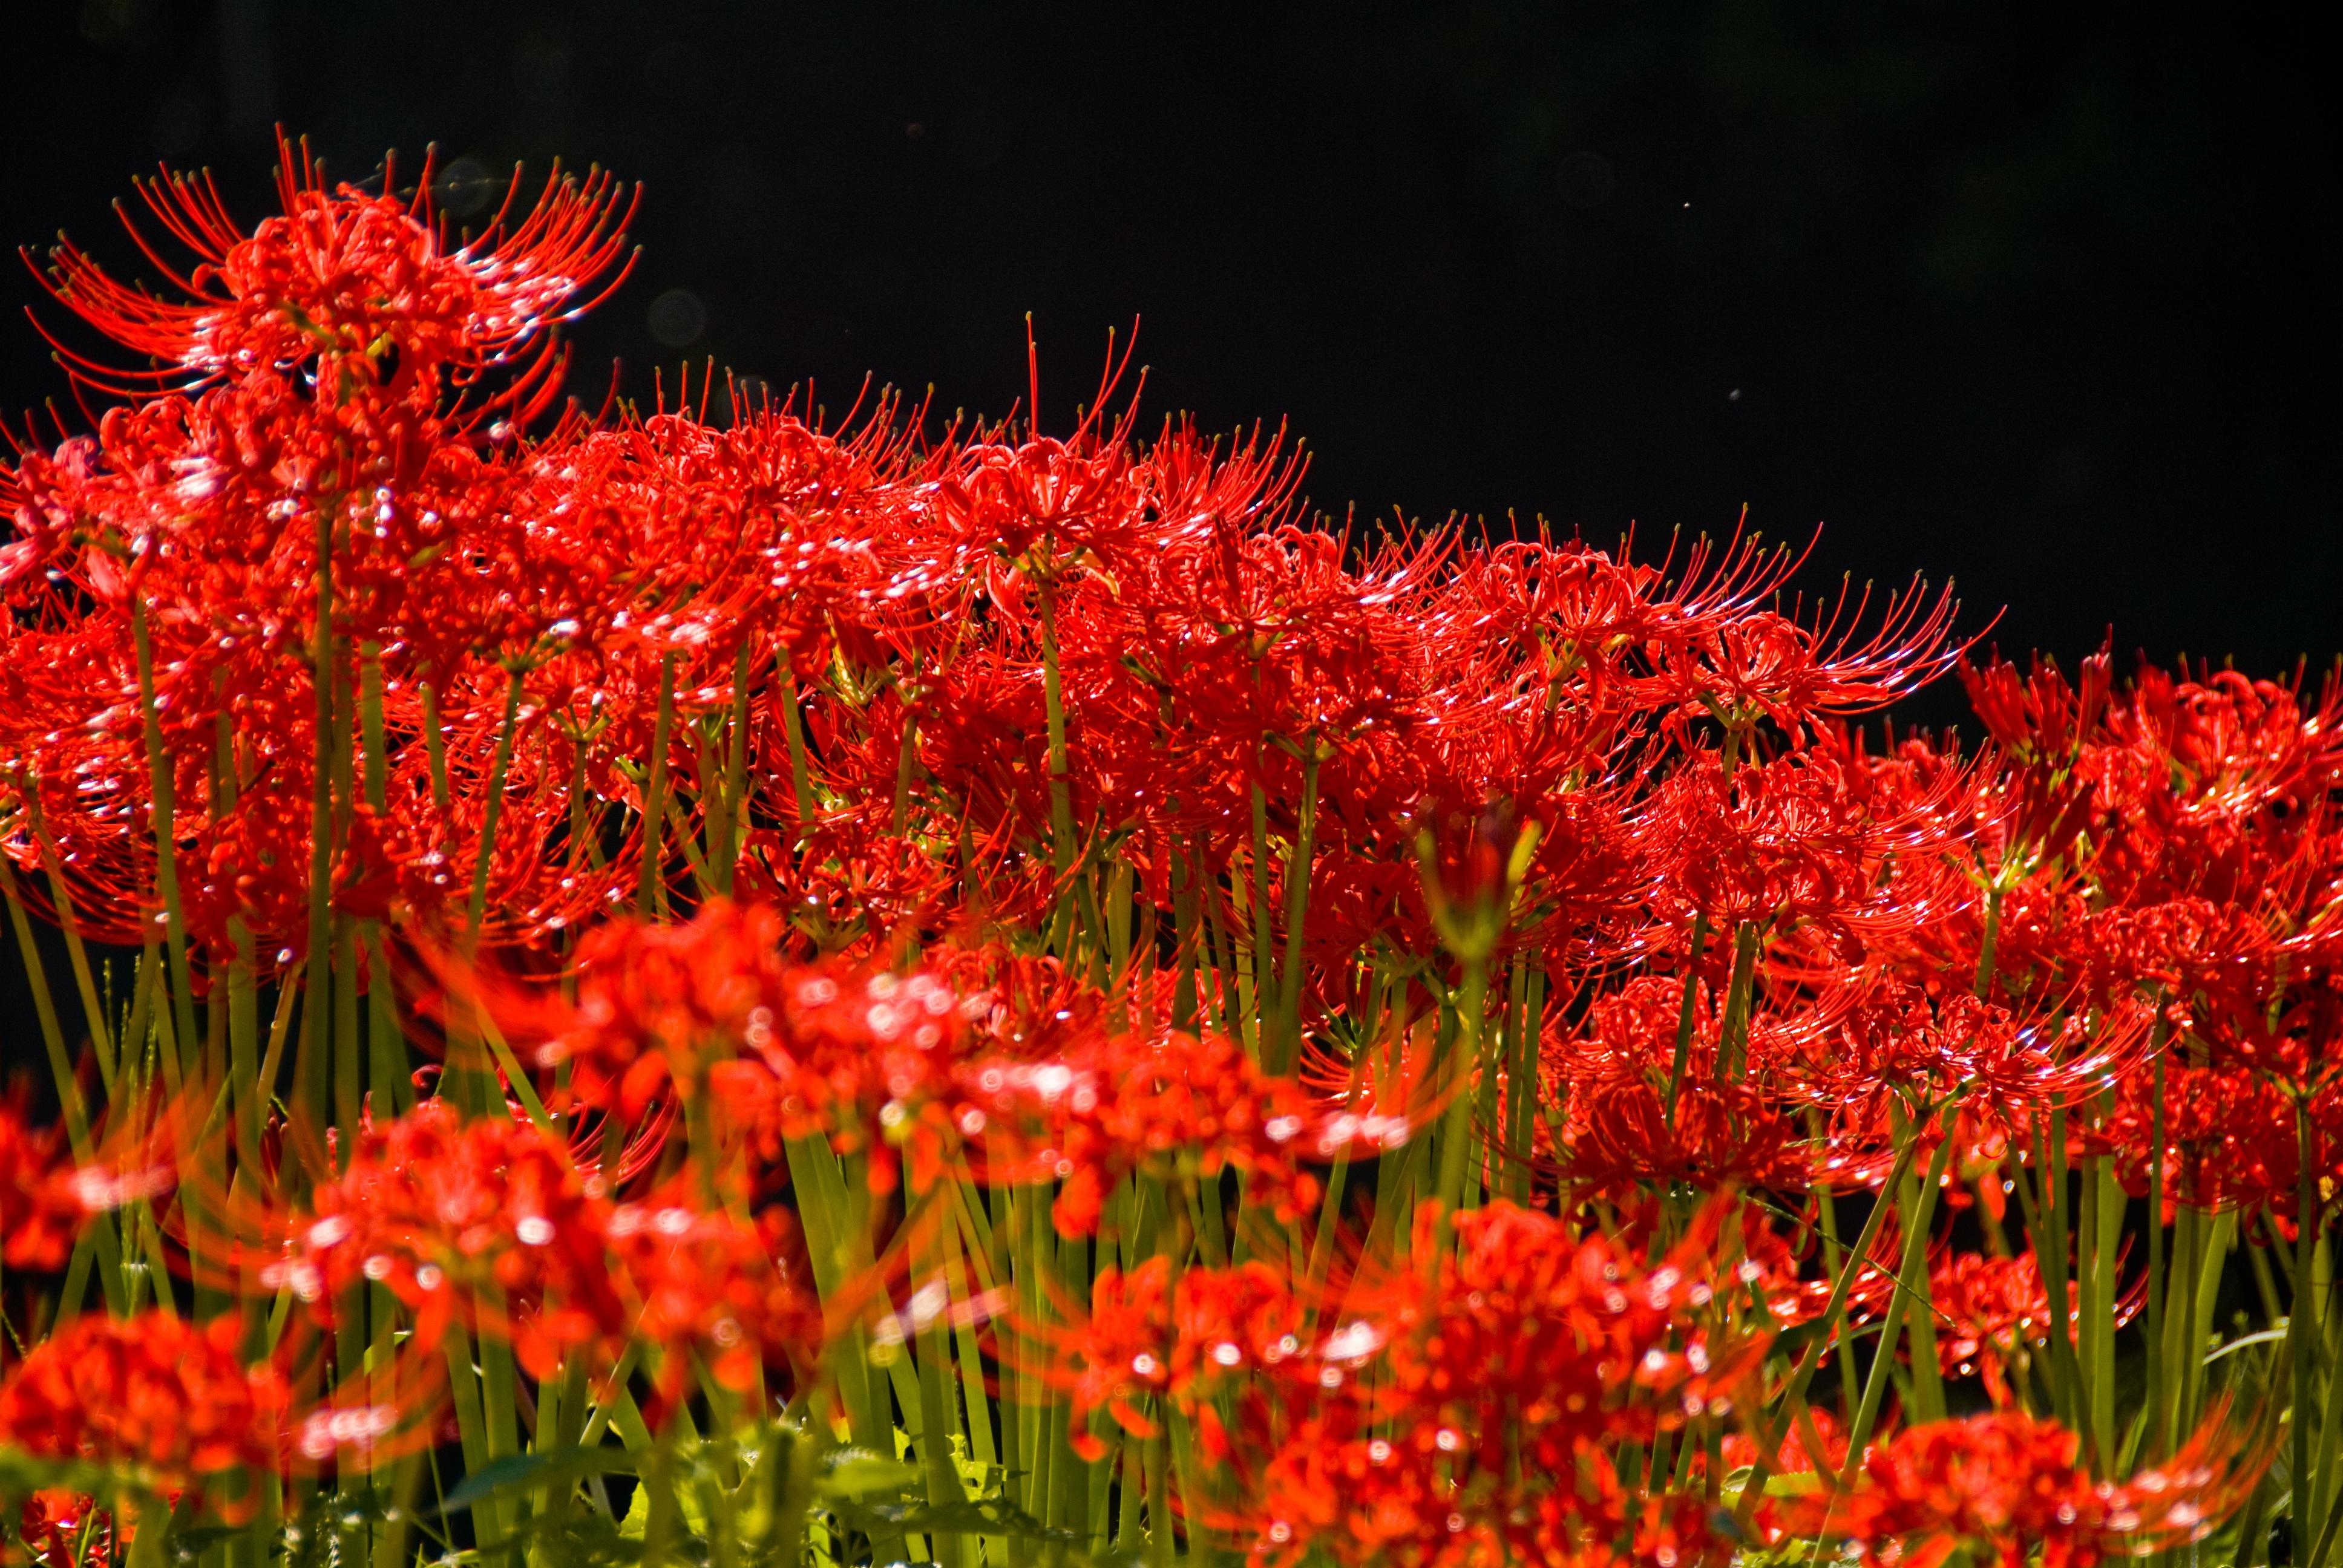 Nature Gr Plant Leaf Flower Red Autumn Botany Flora Season Wildflower Shrub Amaryllis Flowers Macro